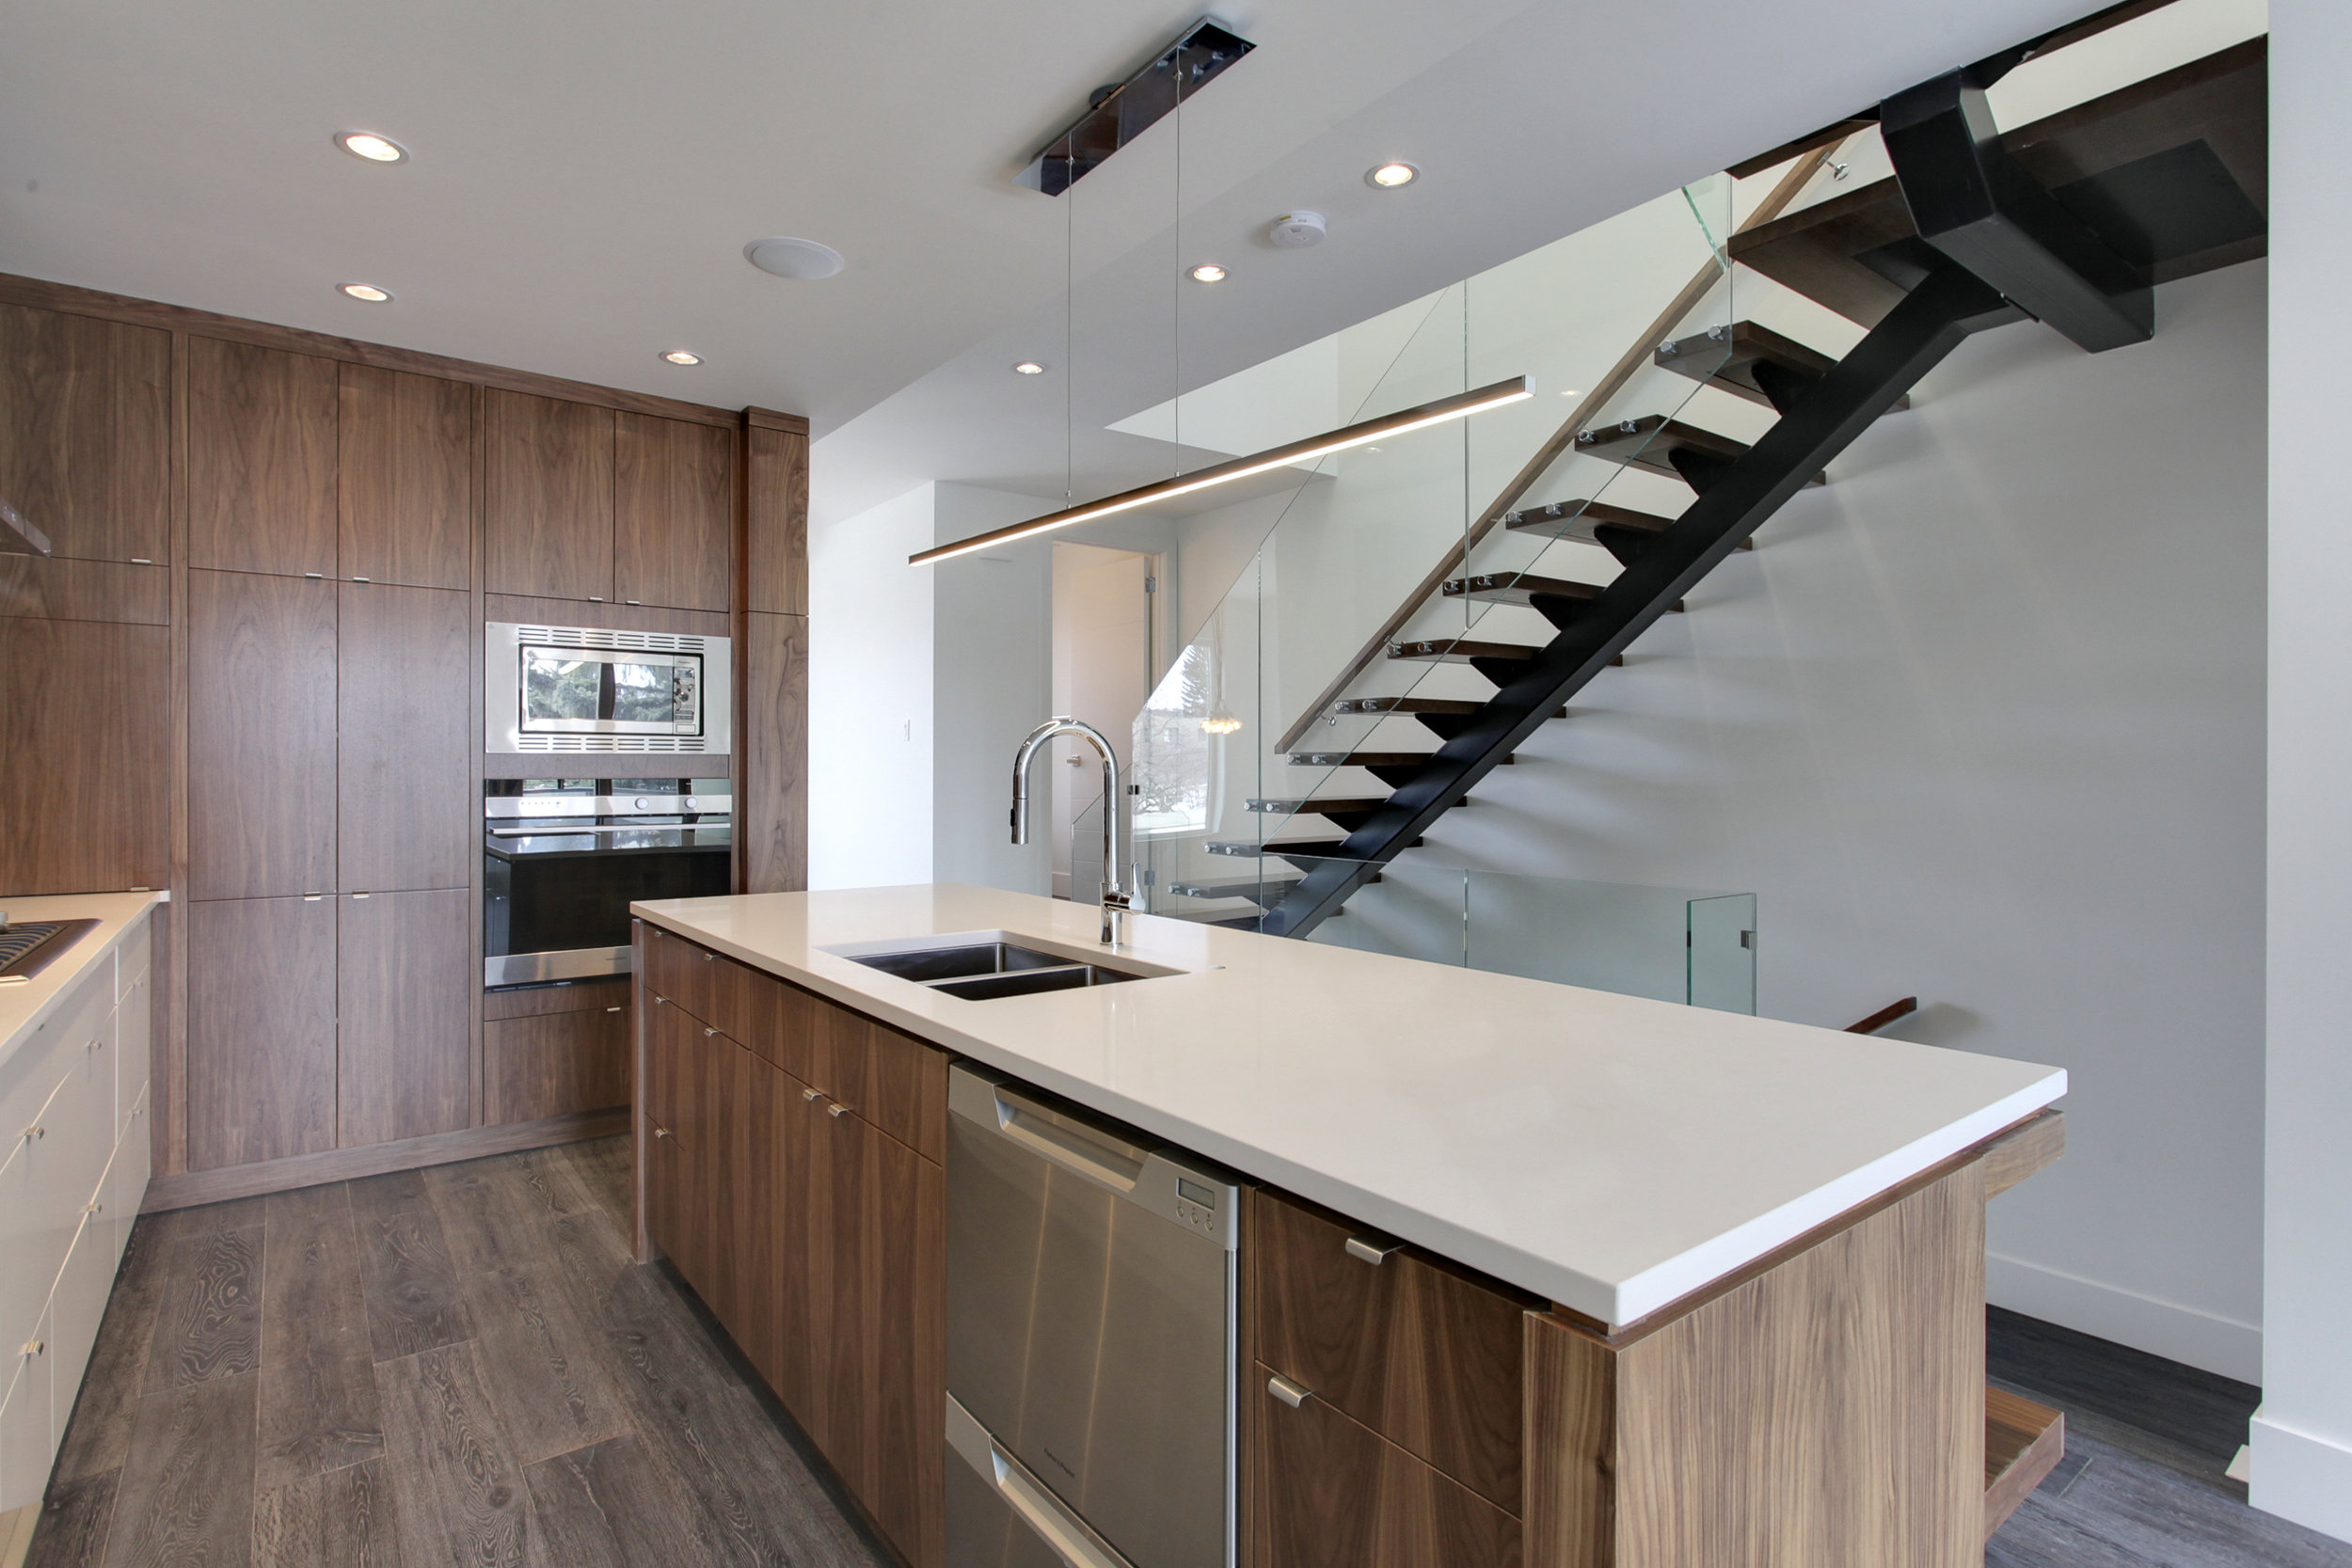 Parcside - Kitchen